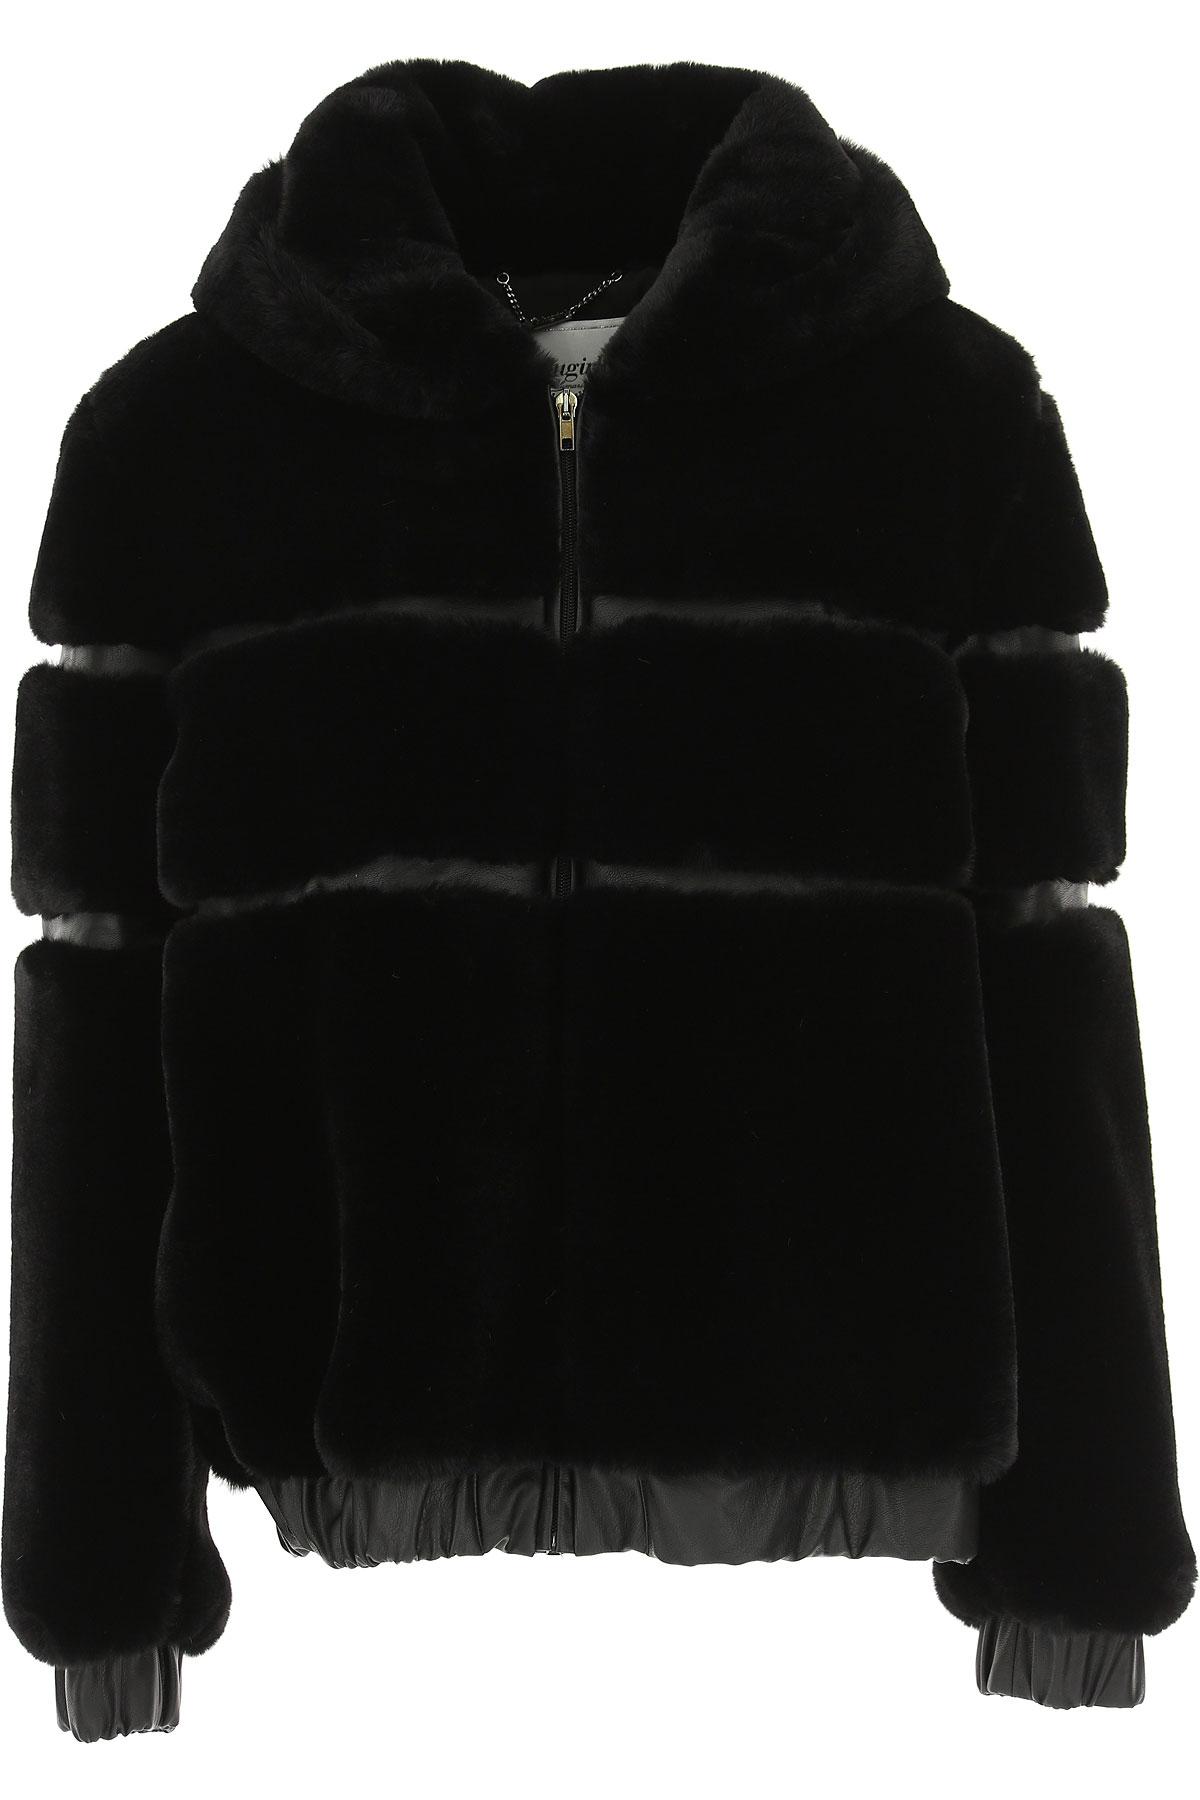 Image of Blugirl Jacket for Women, Black, polyester, 2017, 6 8